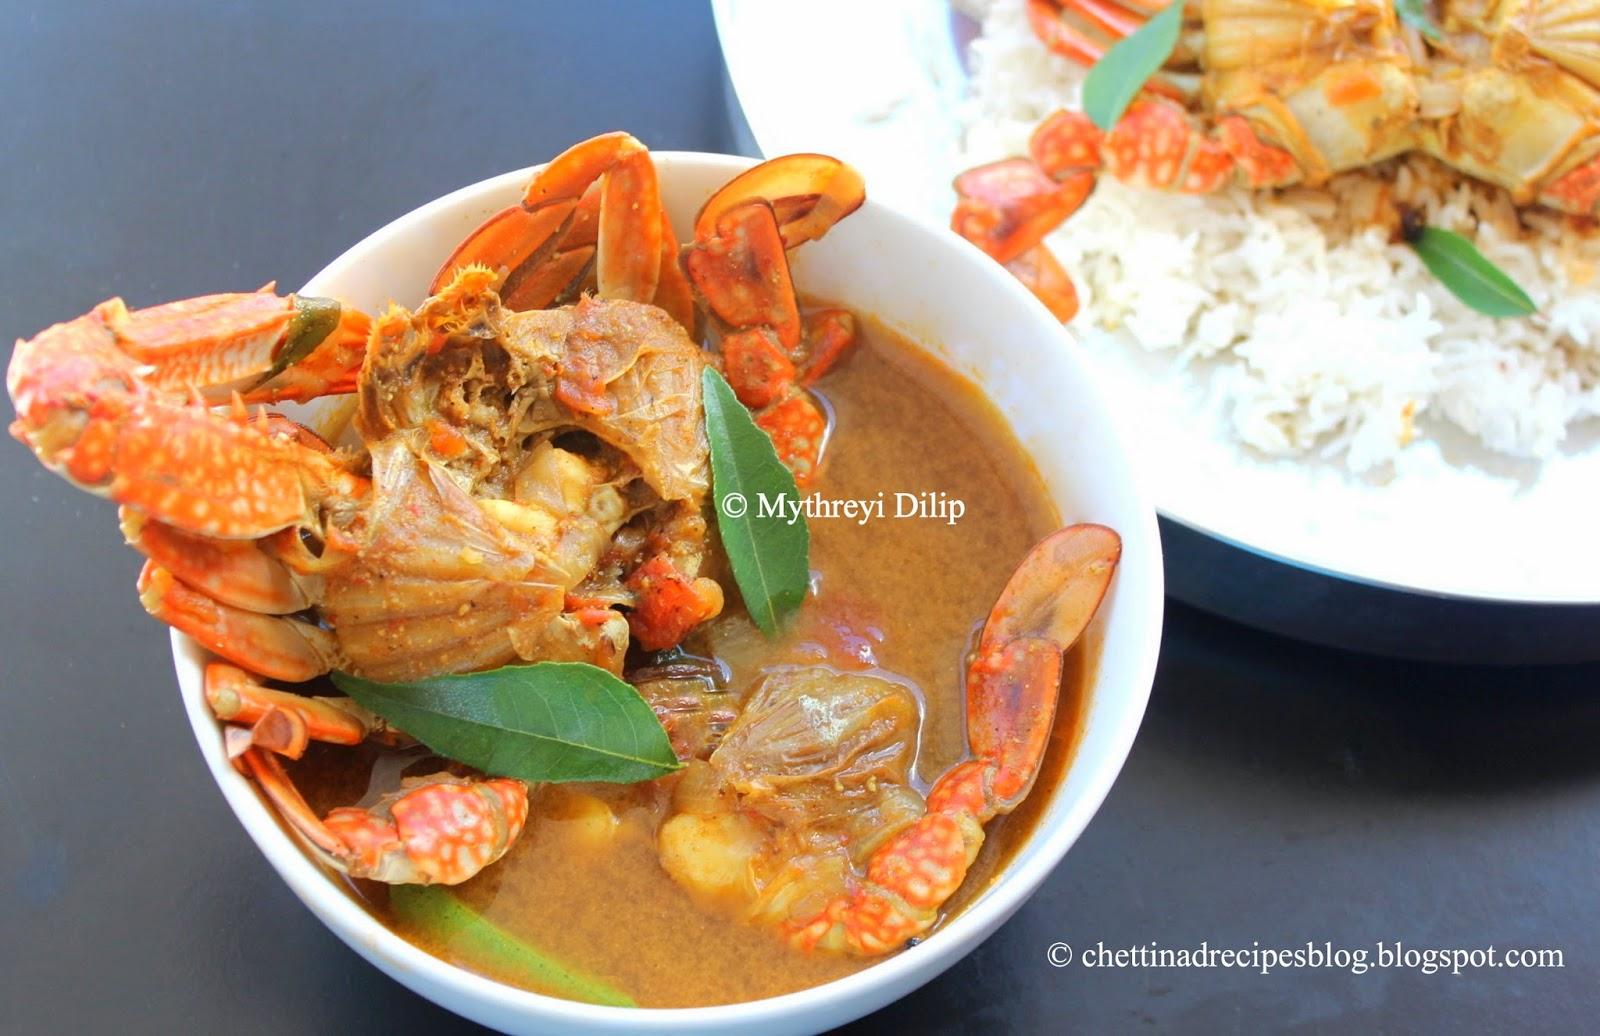 Chettinad nandu rasam crab soup chettinad recipes chettinad nandu rasam crab soup forumfinder Image collections